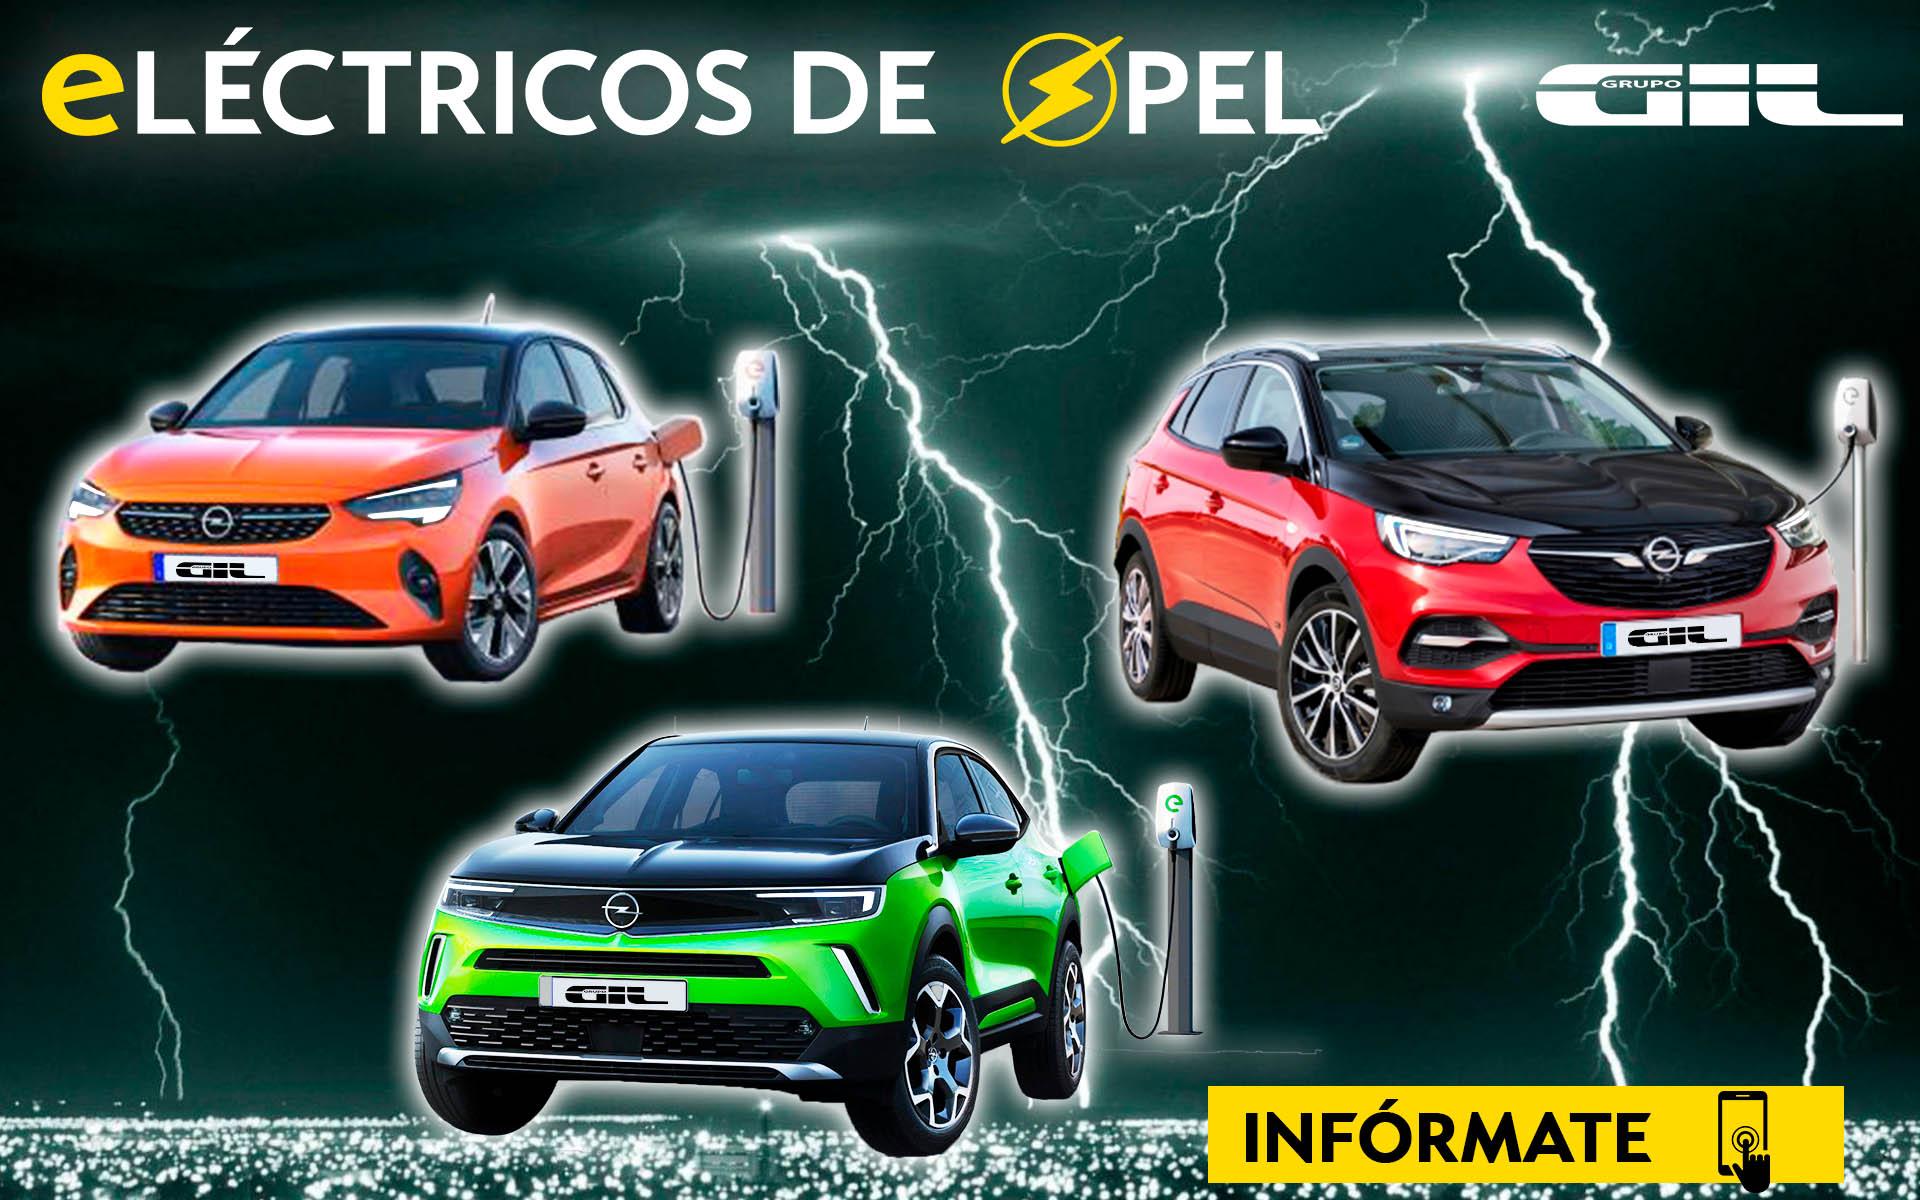 Eléctricos de Opel GIL